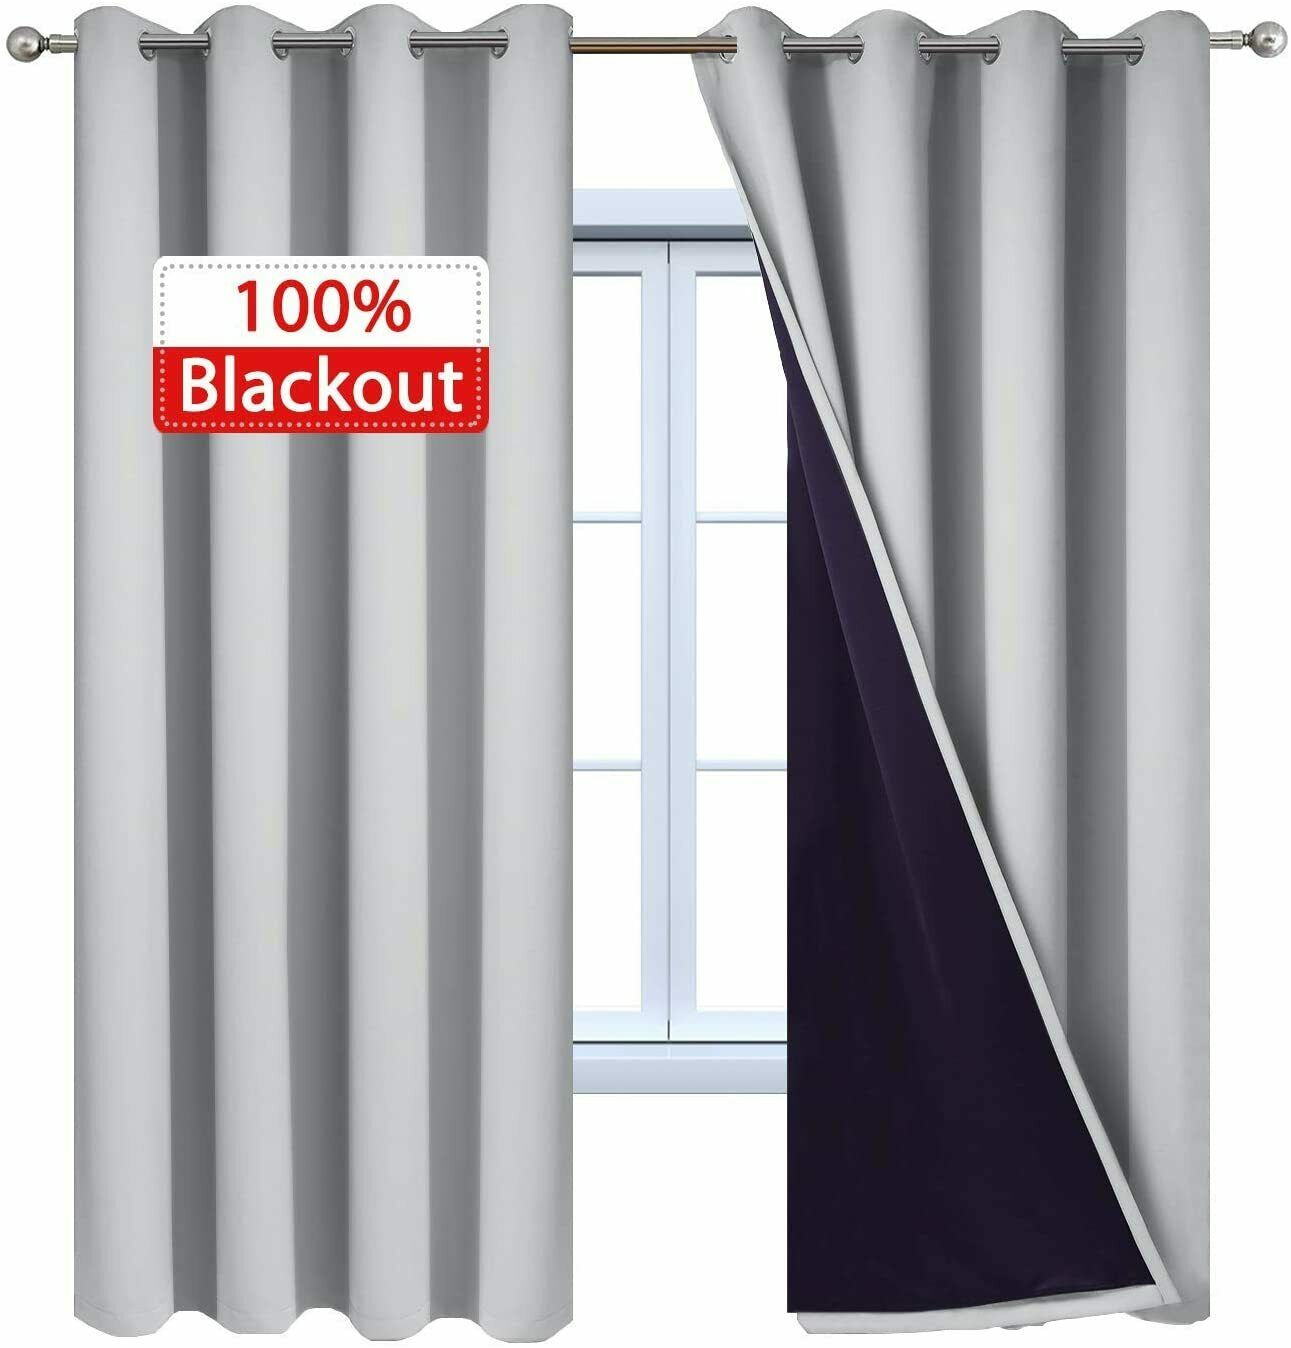 blackout window curtain panels heat full light